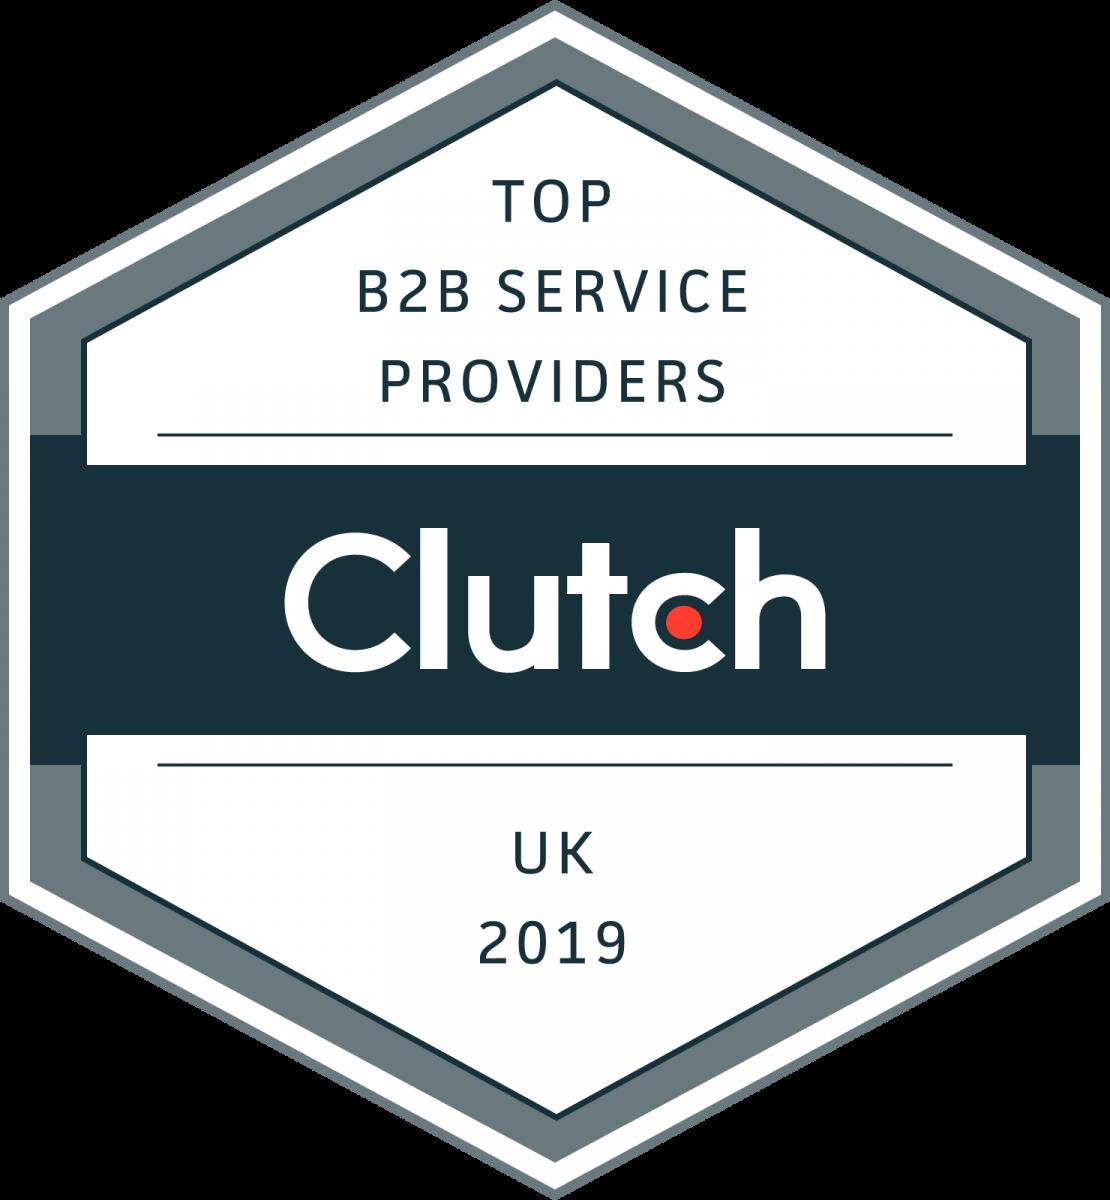 b2b_service_providers_uk_2019_1200